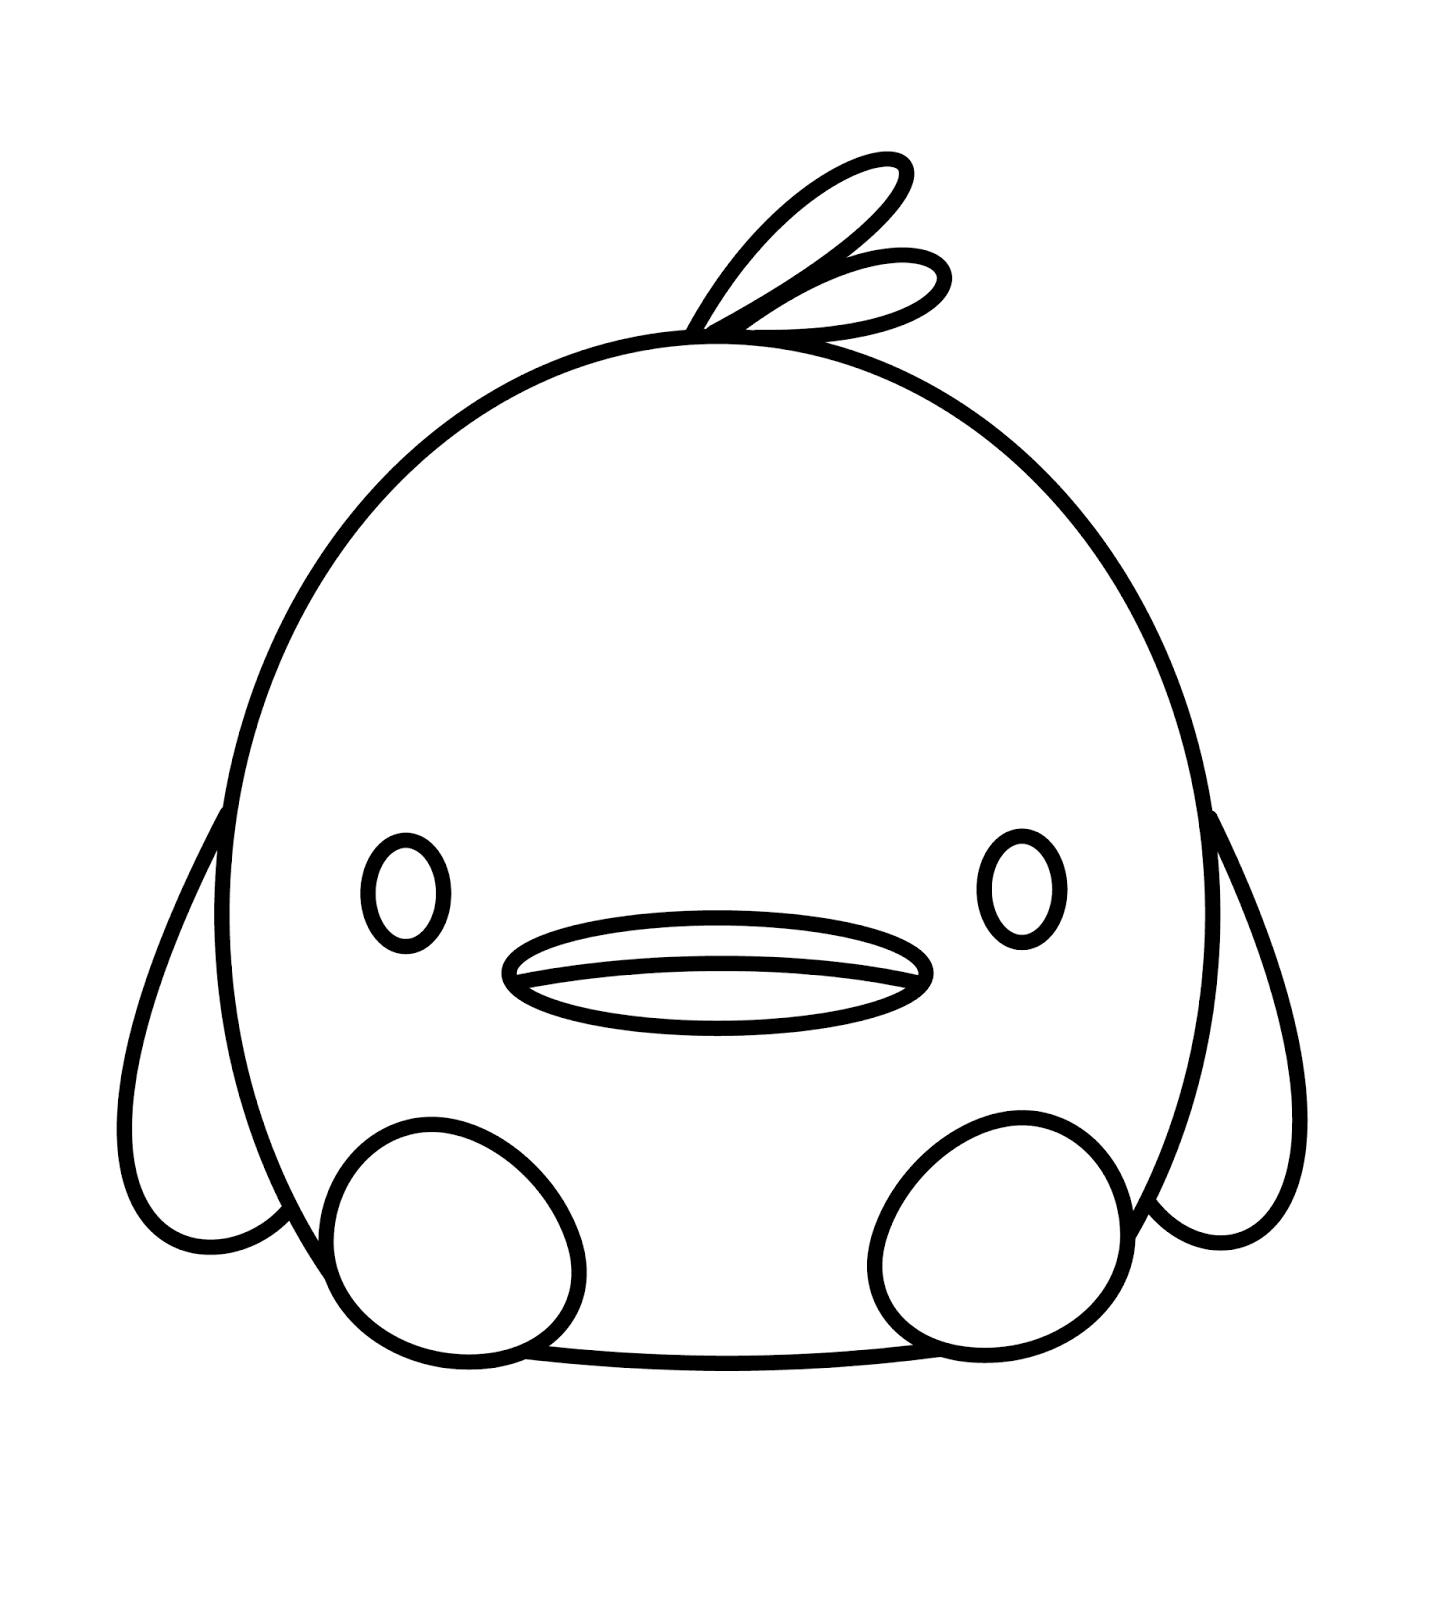 Cute N Kawaii: How To Draw A Kawaii Duck